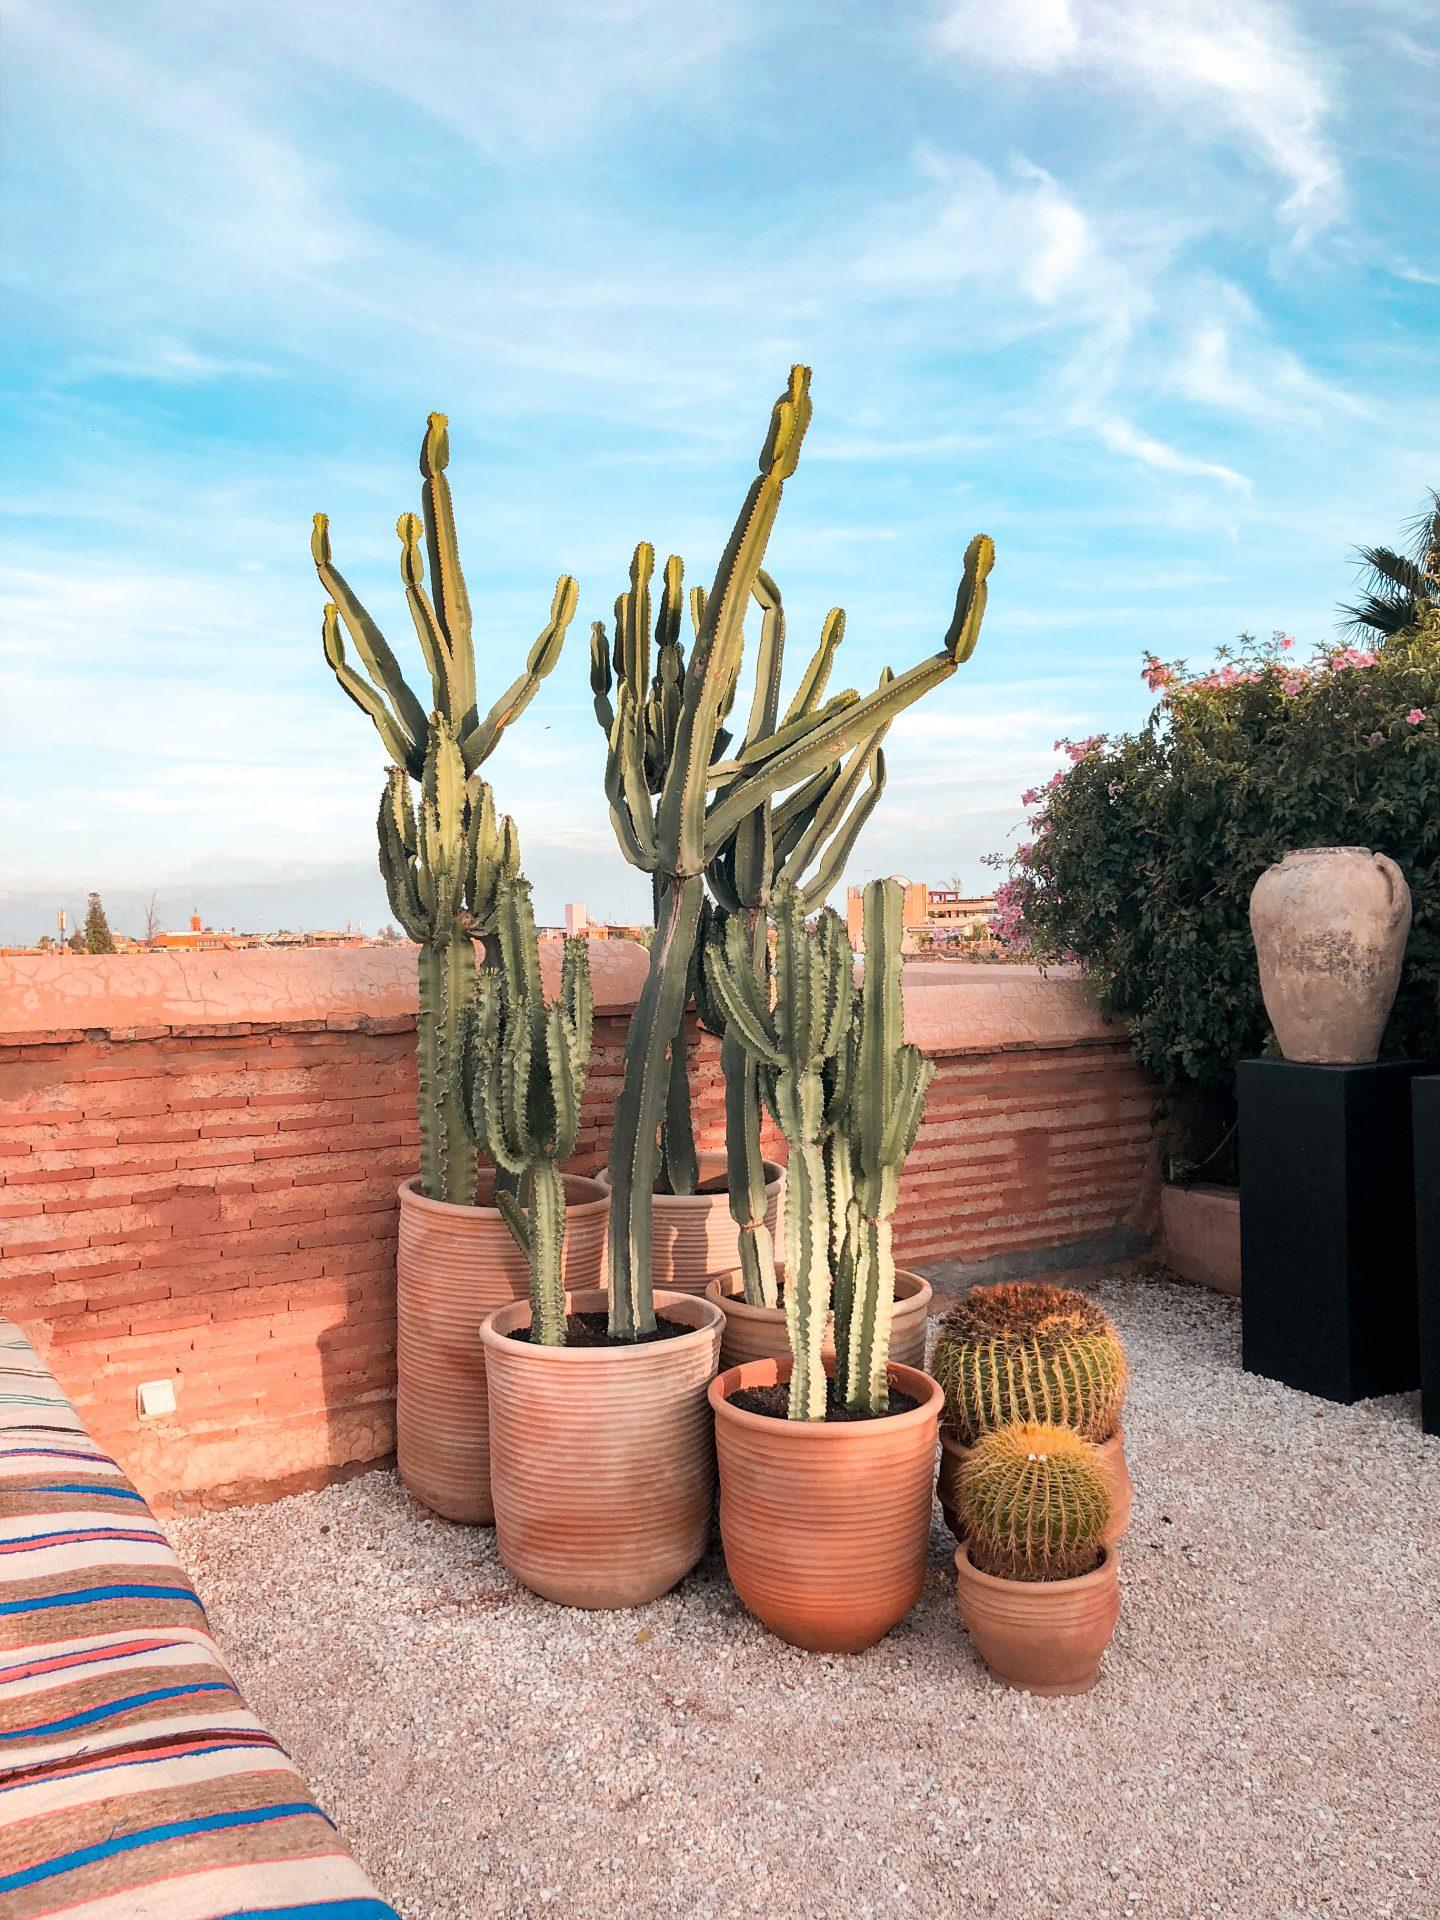 Best rooftops in Marrakech